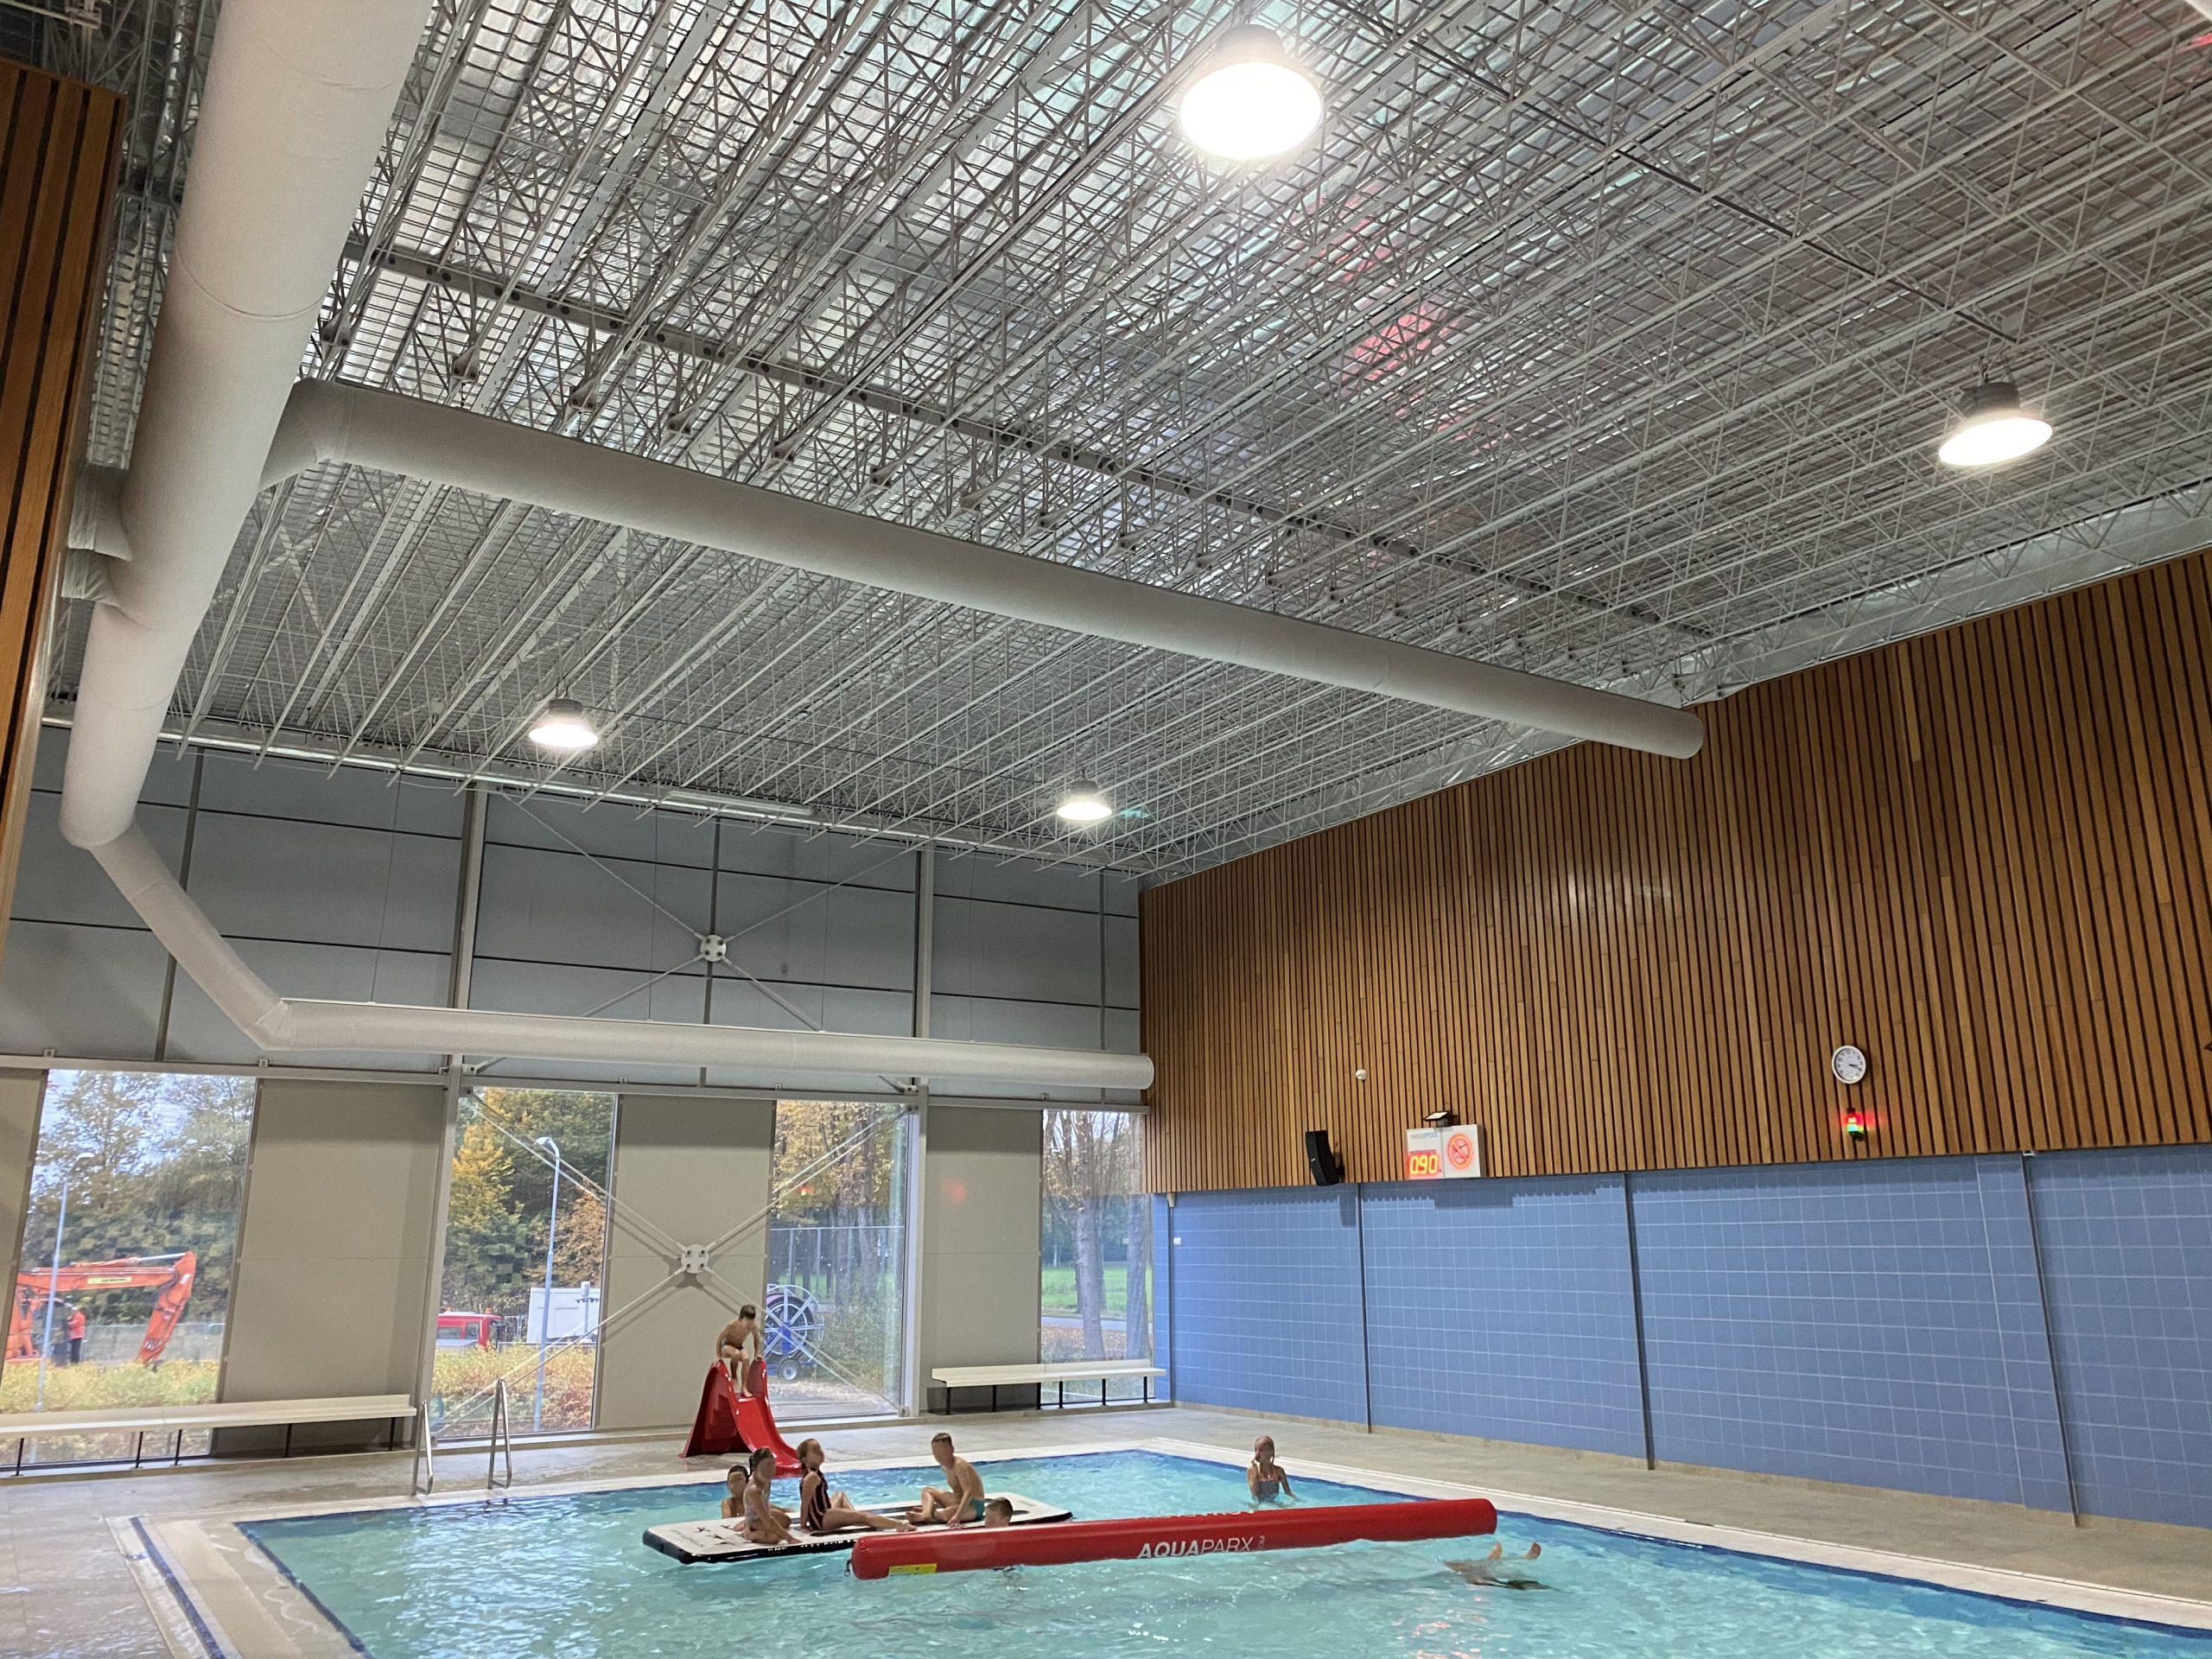 Zwembad-MFC-De-Marke-Hattem-scaled